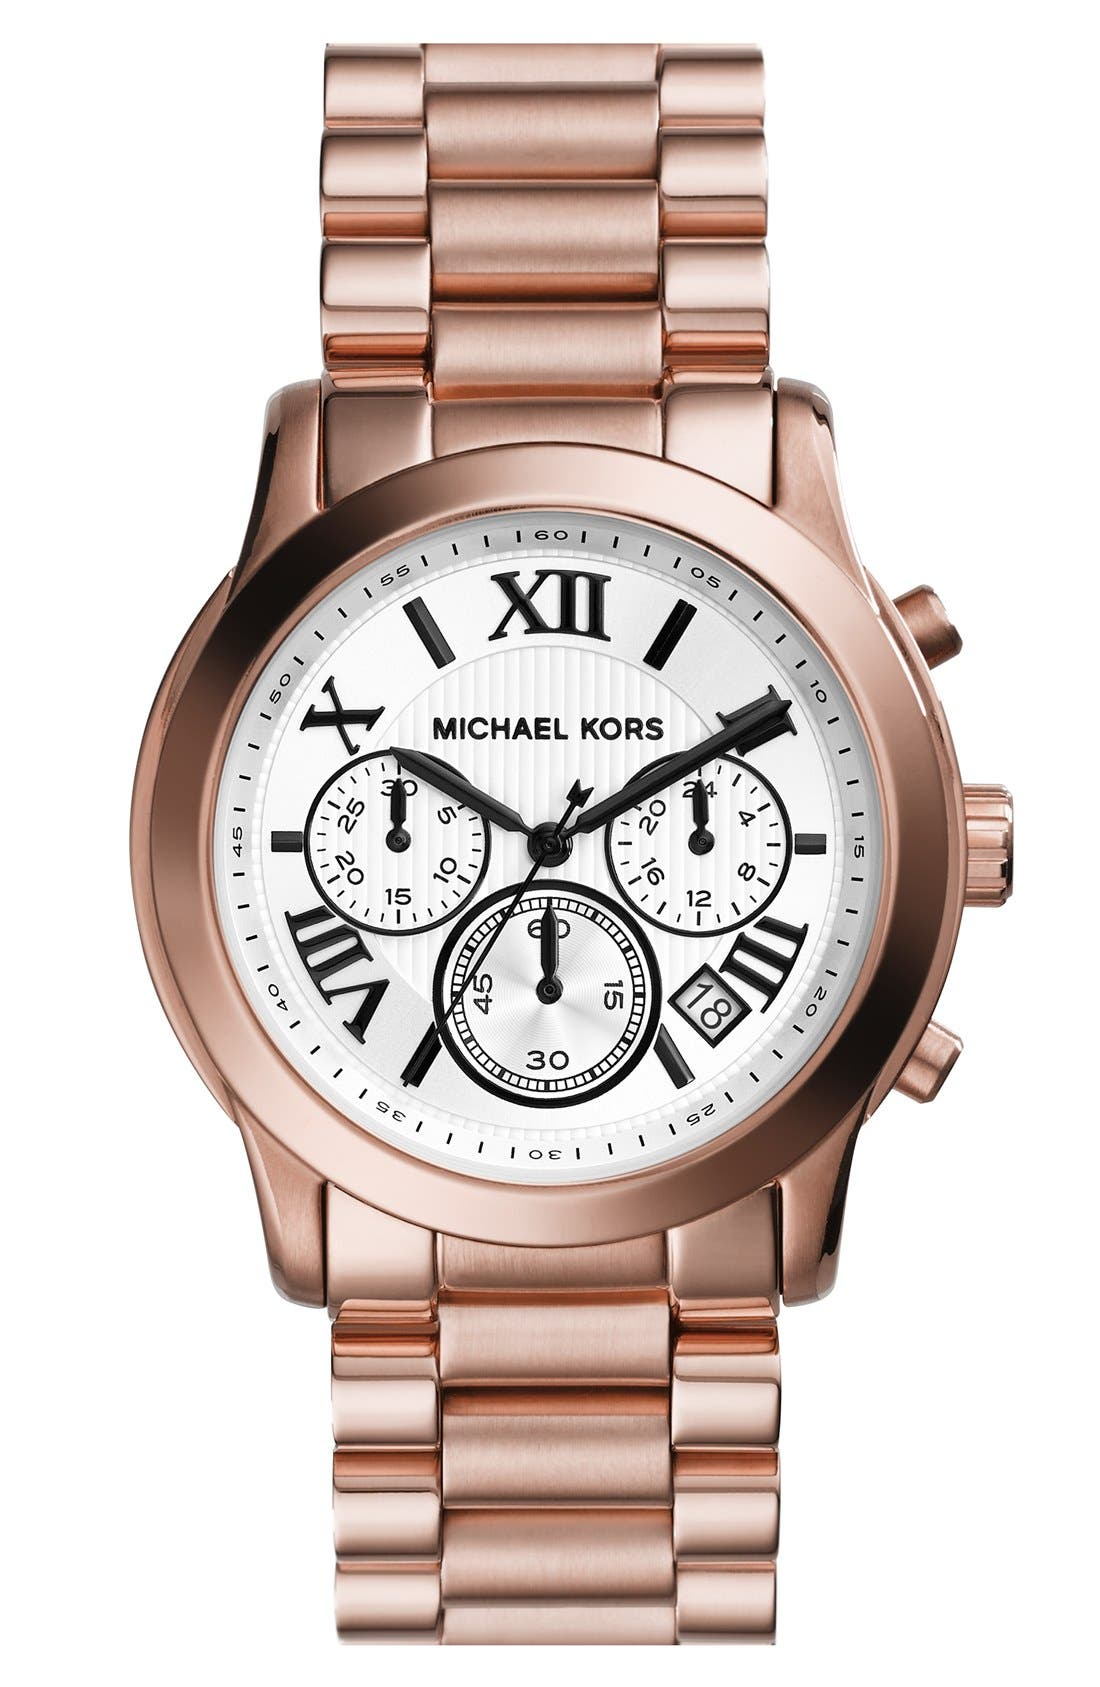 Main Image - Michael Kors 'Cooper' Chronograph Bracelet Watch, 39mm